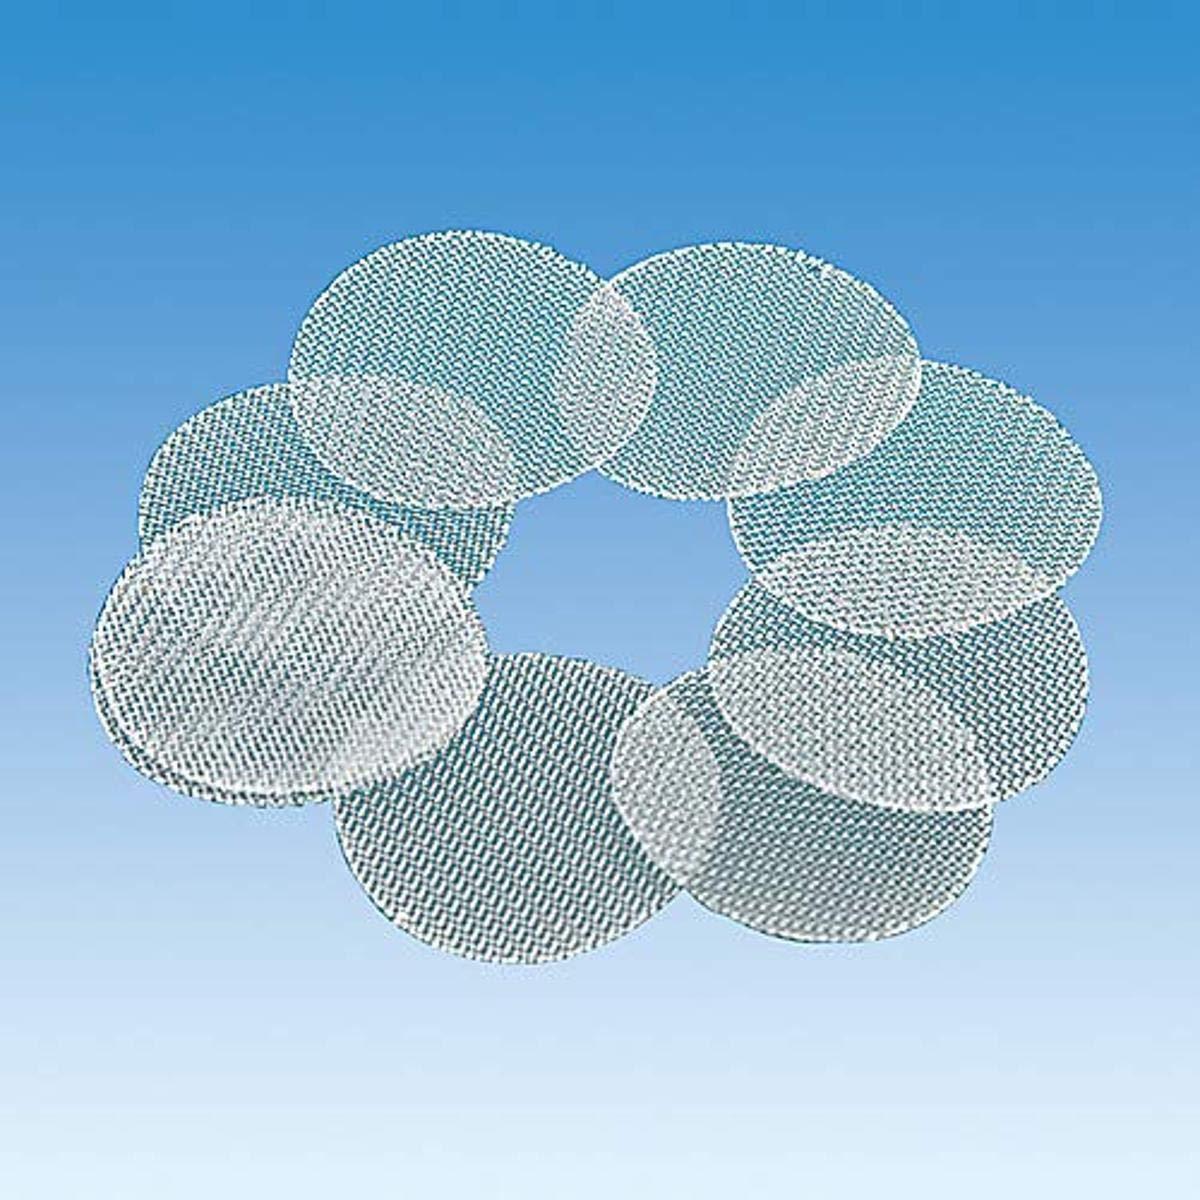 ACE Philadelphia Mall GLASS 5814-206 Series Paper Filter mm Max 43% OFF 7 Diameter 7.5 Disc